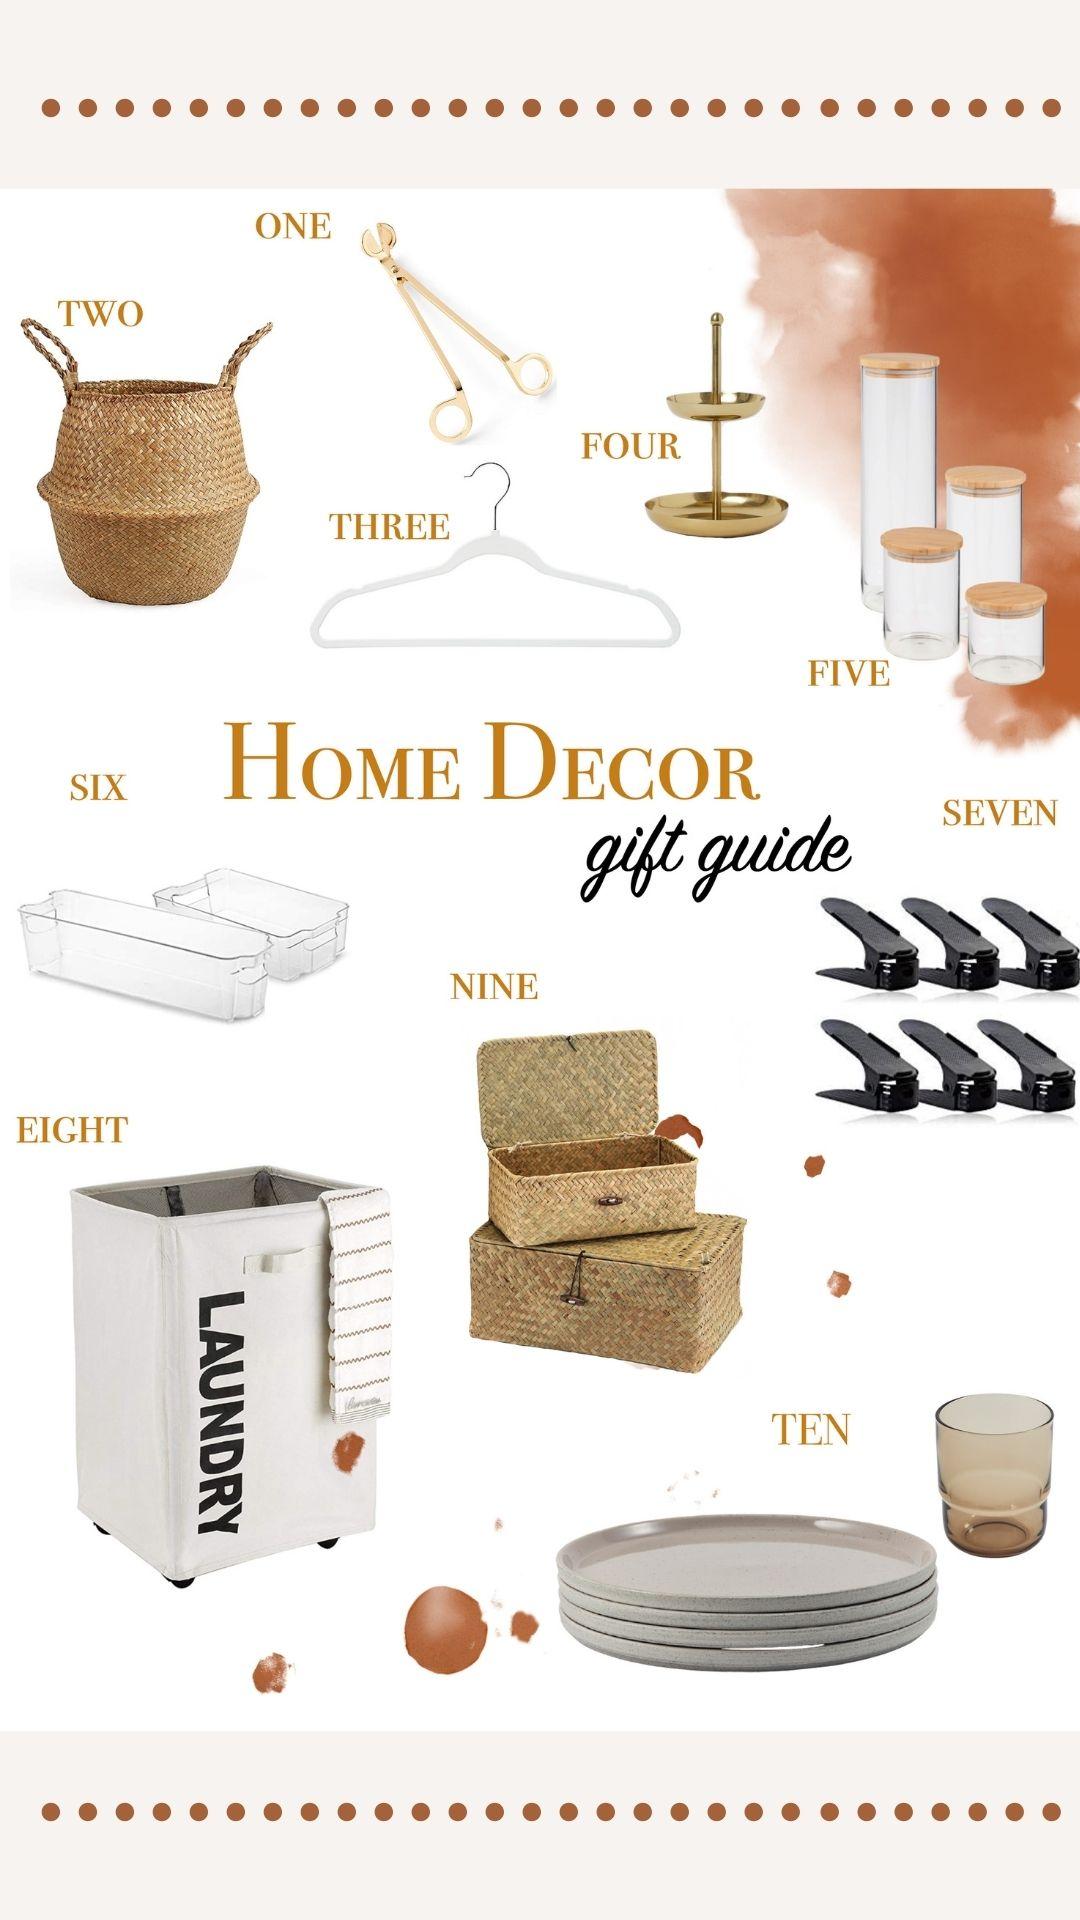 Gift Guide- Home Decor